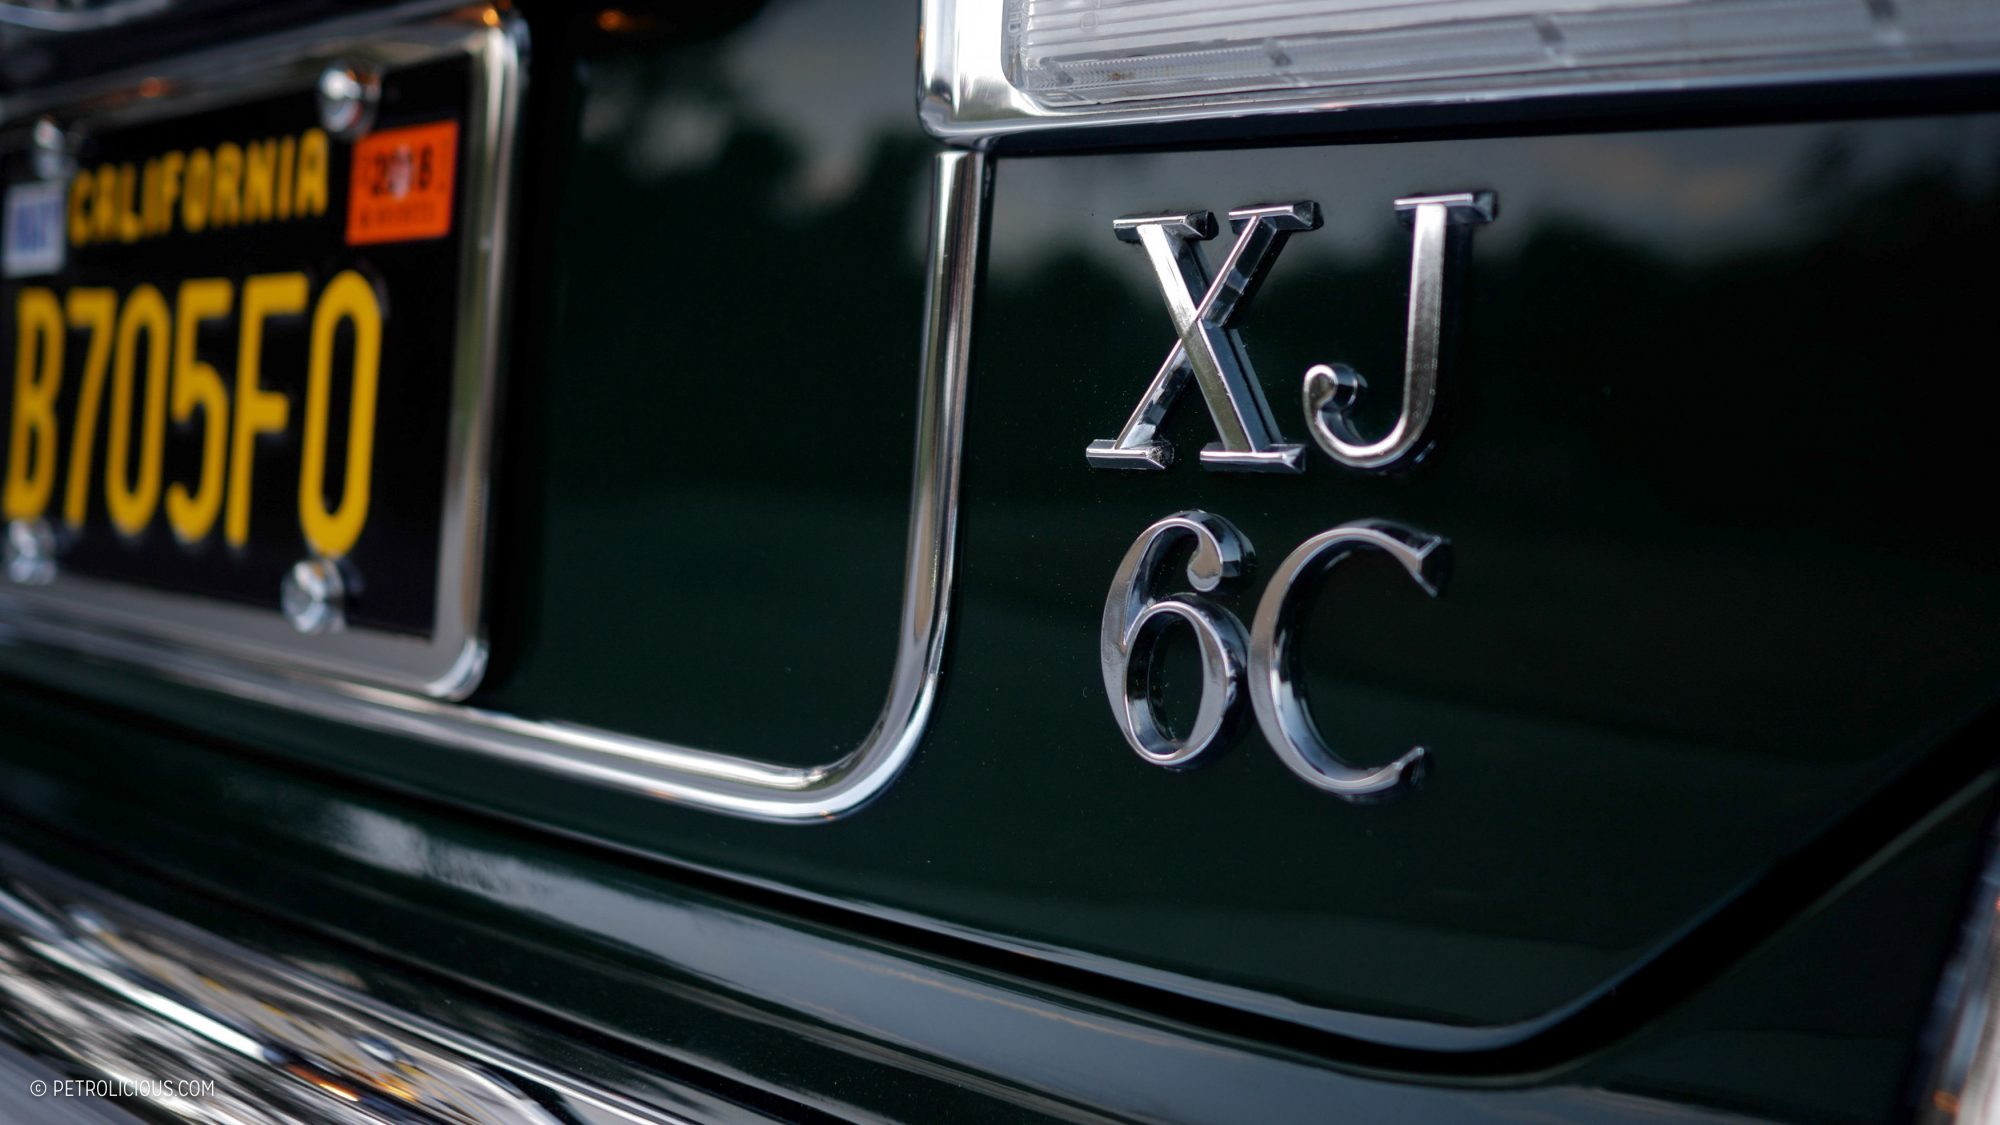 Jaguar XJ6C название модели